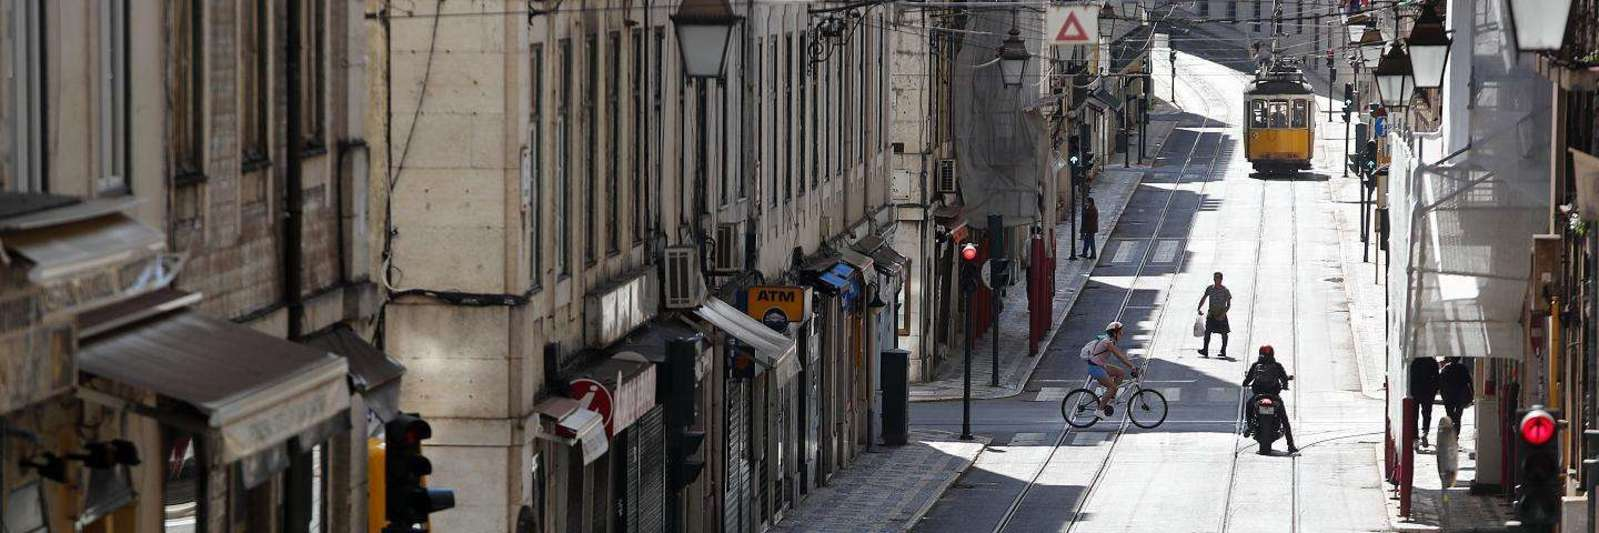 Der zweite Corona-LockDown in Portugal: leere Straßen